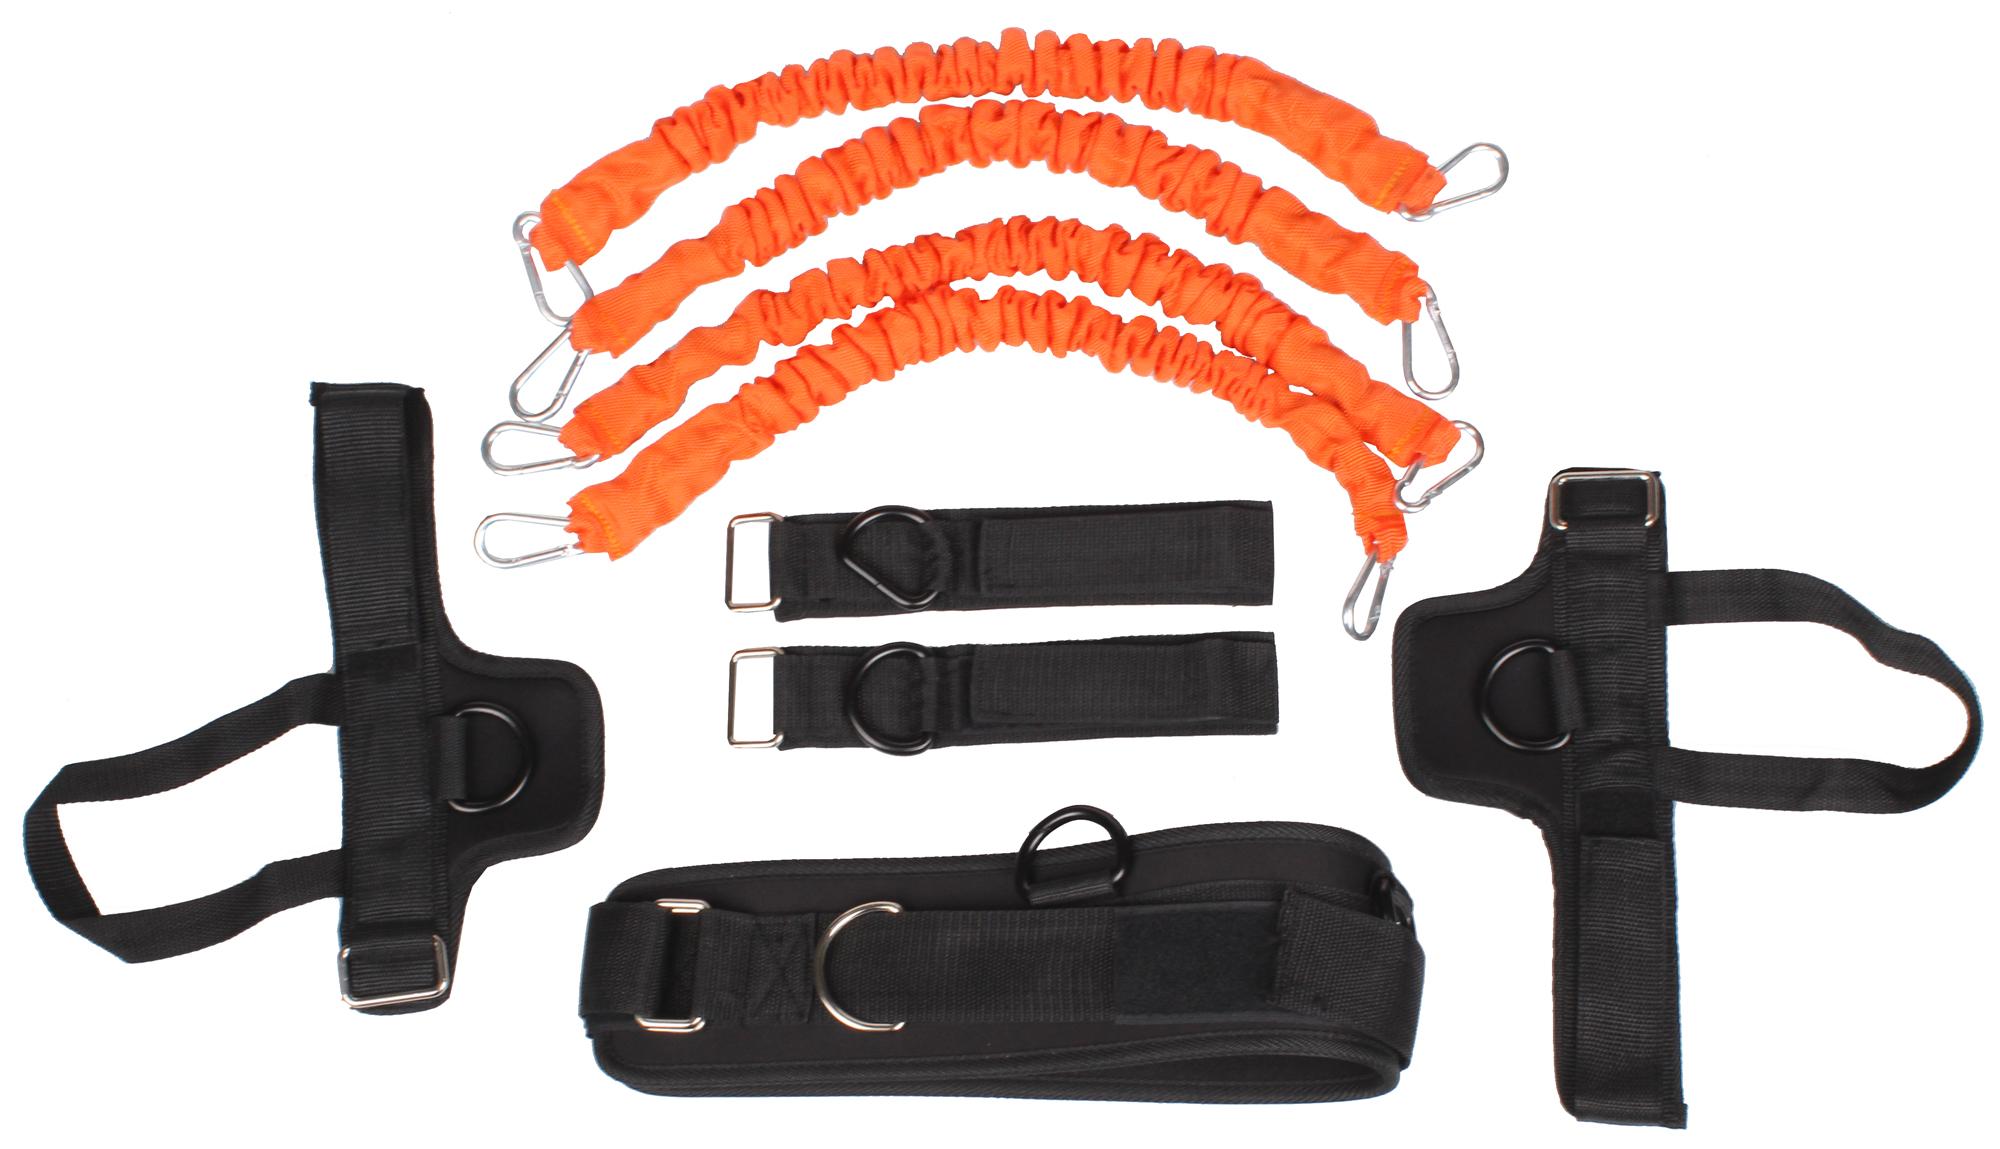 Tréningové lano - odporová guma (Python Striker)